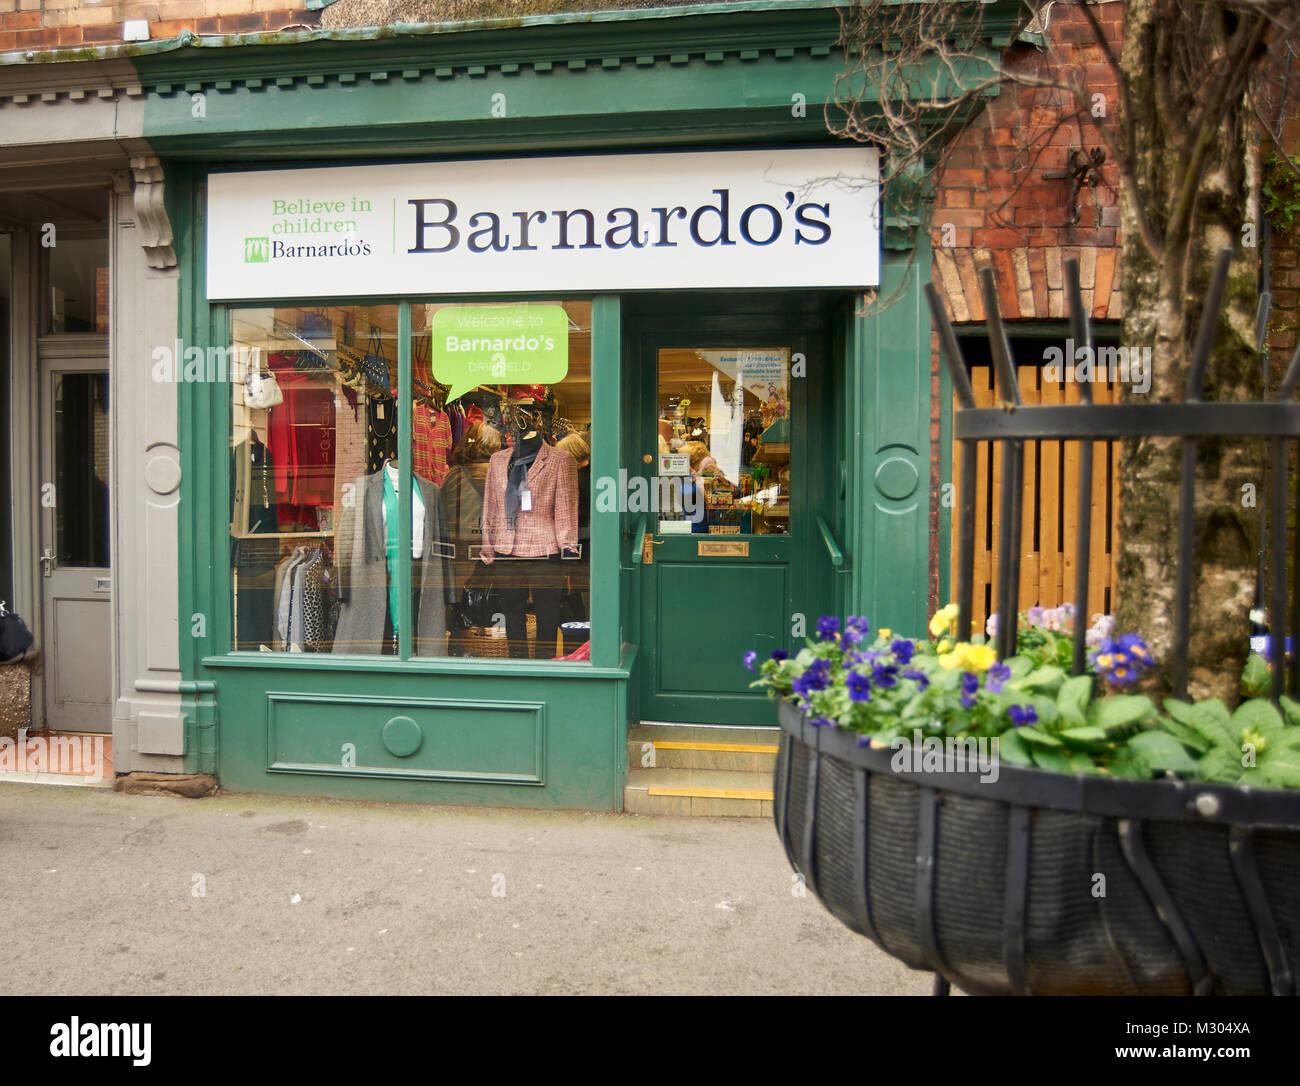 Barnardo's High Street Charity shop - Stock Image